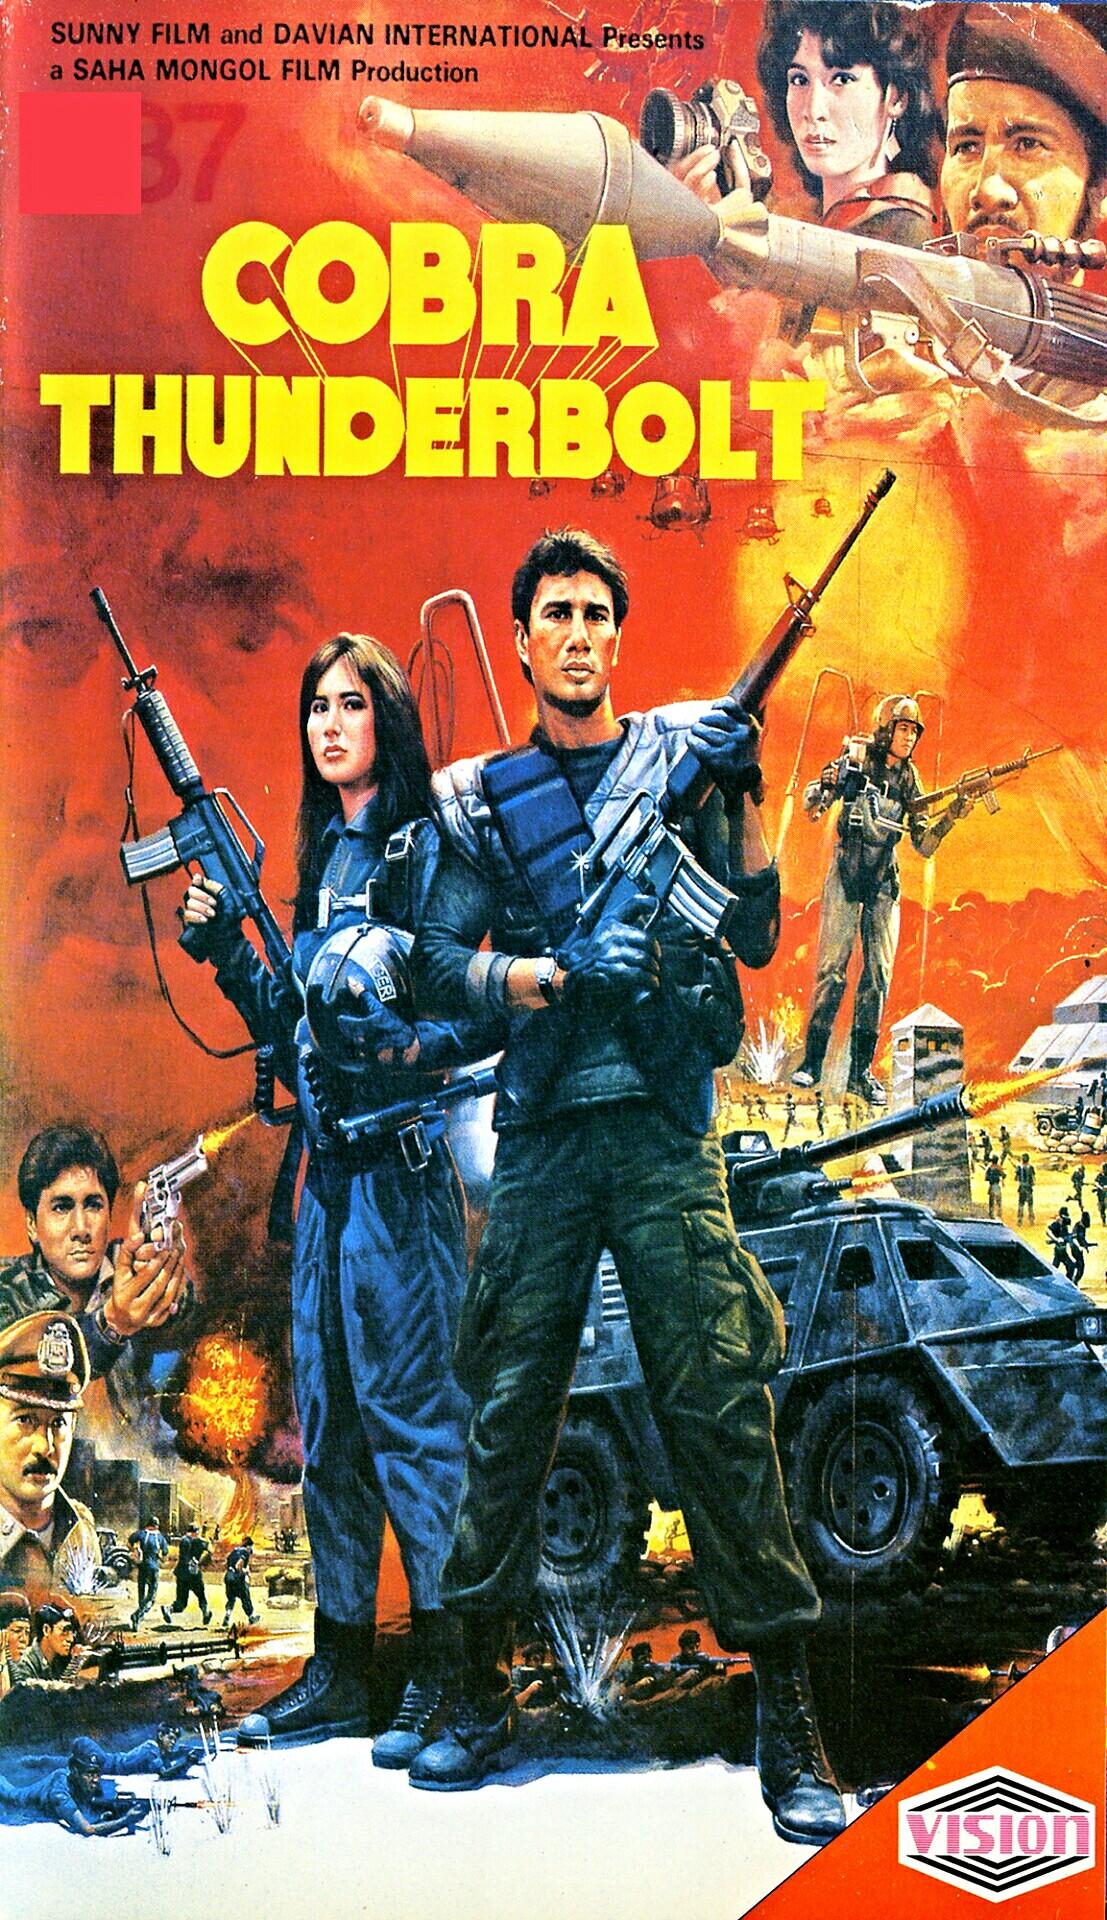 Cobra Thunderbolt ((1984))